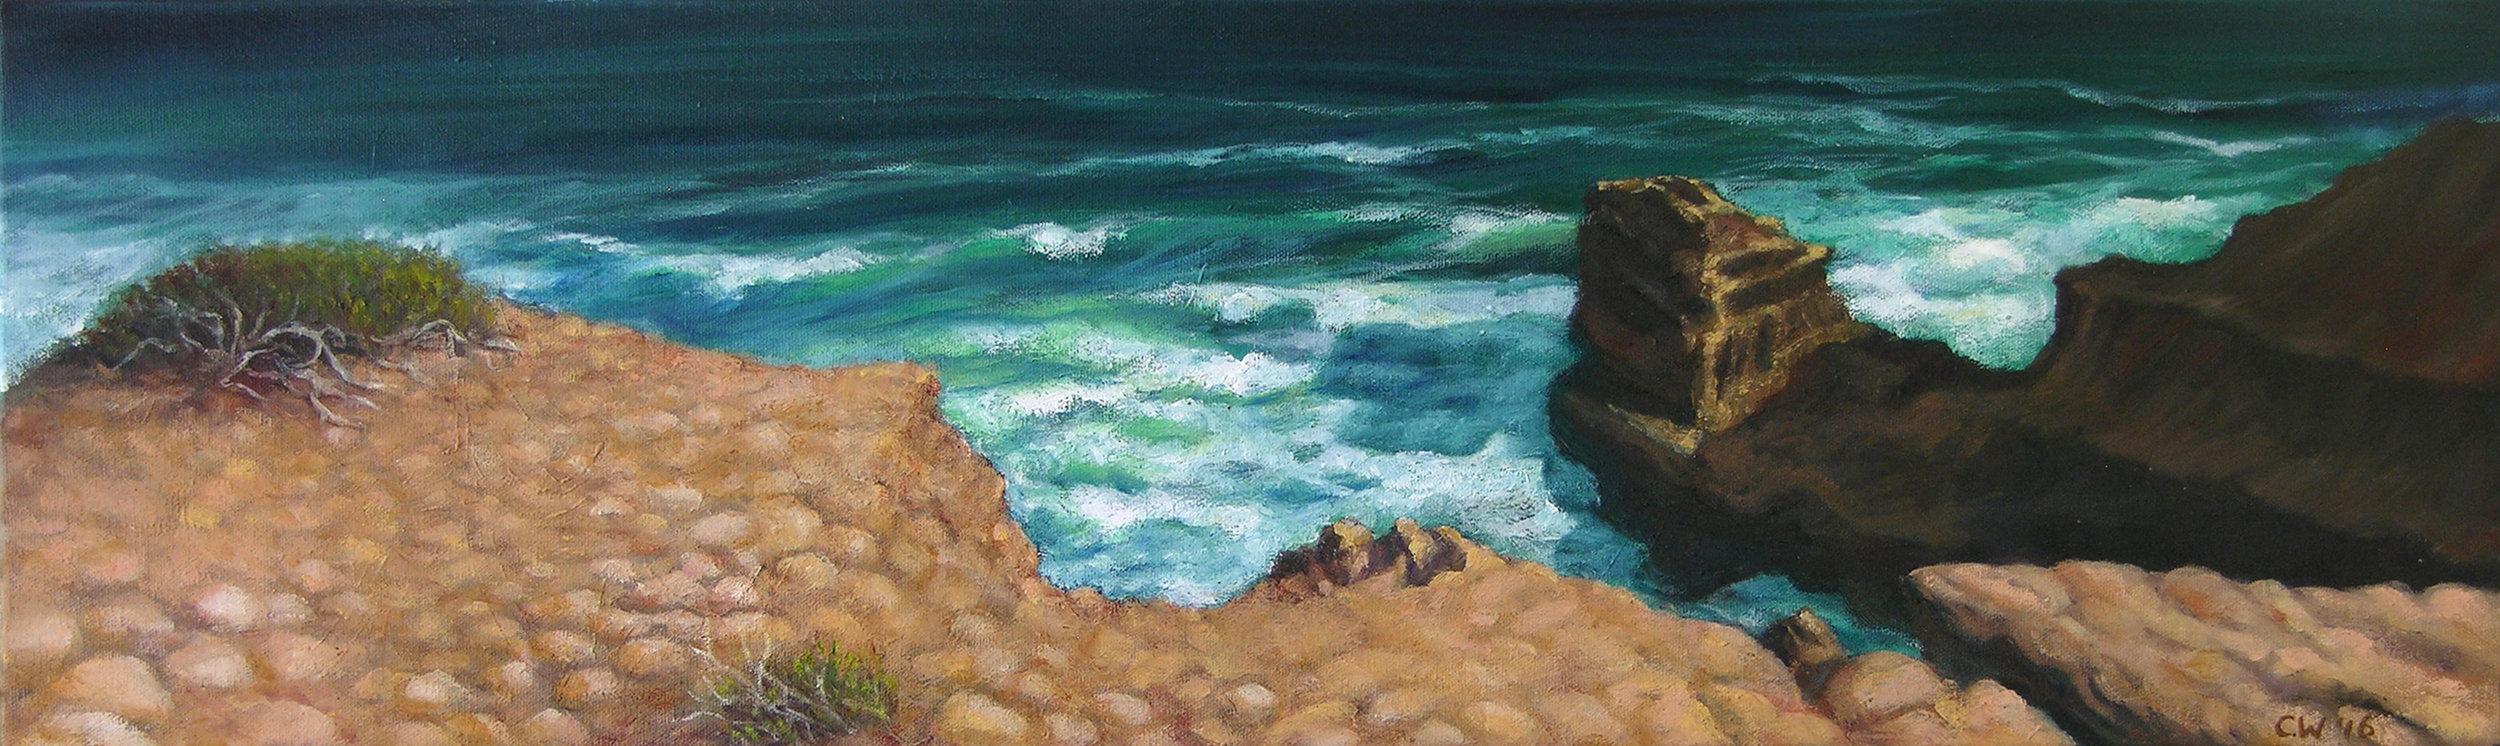 Cliff Edge _ Whitewater 1 23 x 76cm.jpg